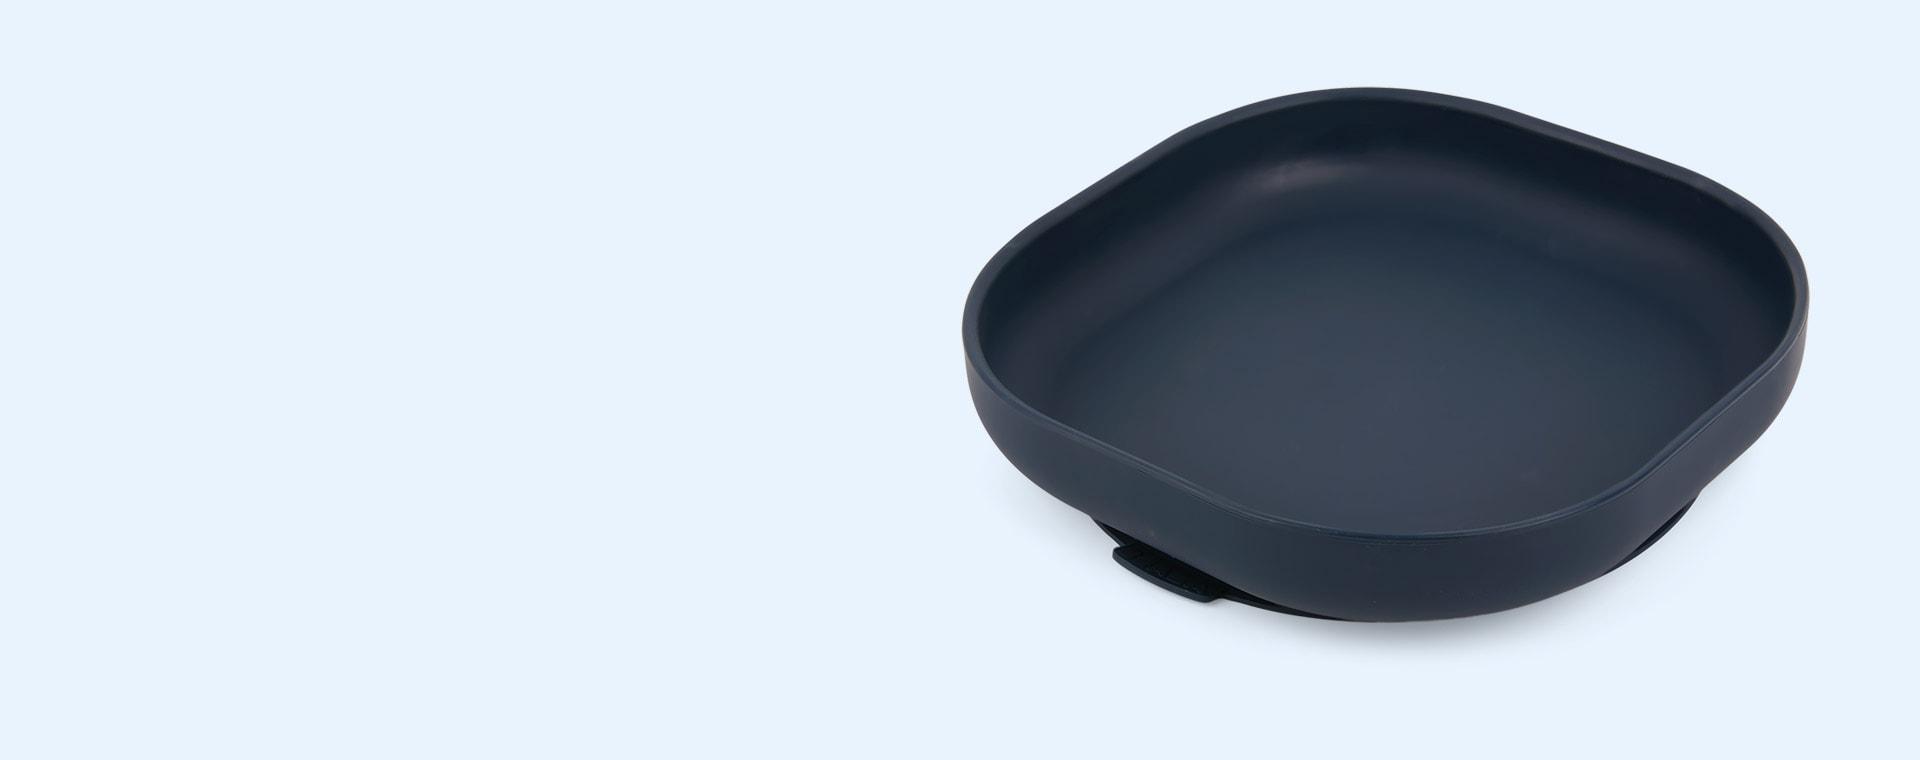 Night Blue Beaba Silicone Meal Set